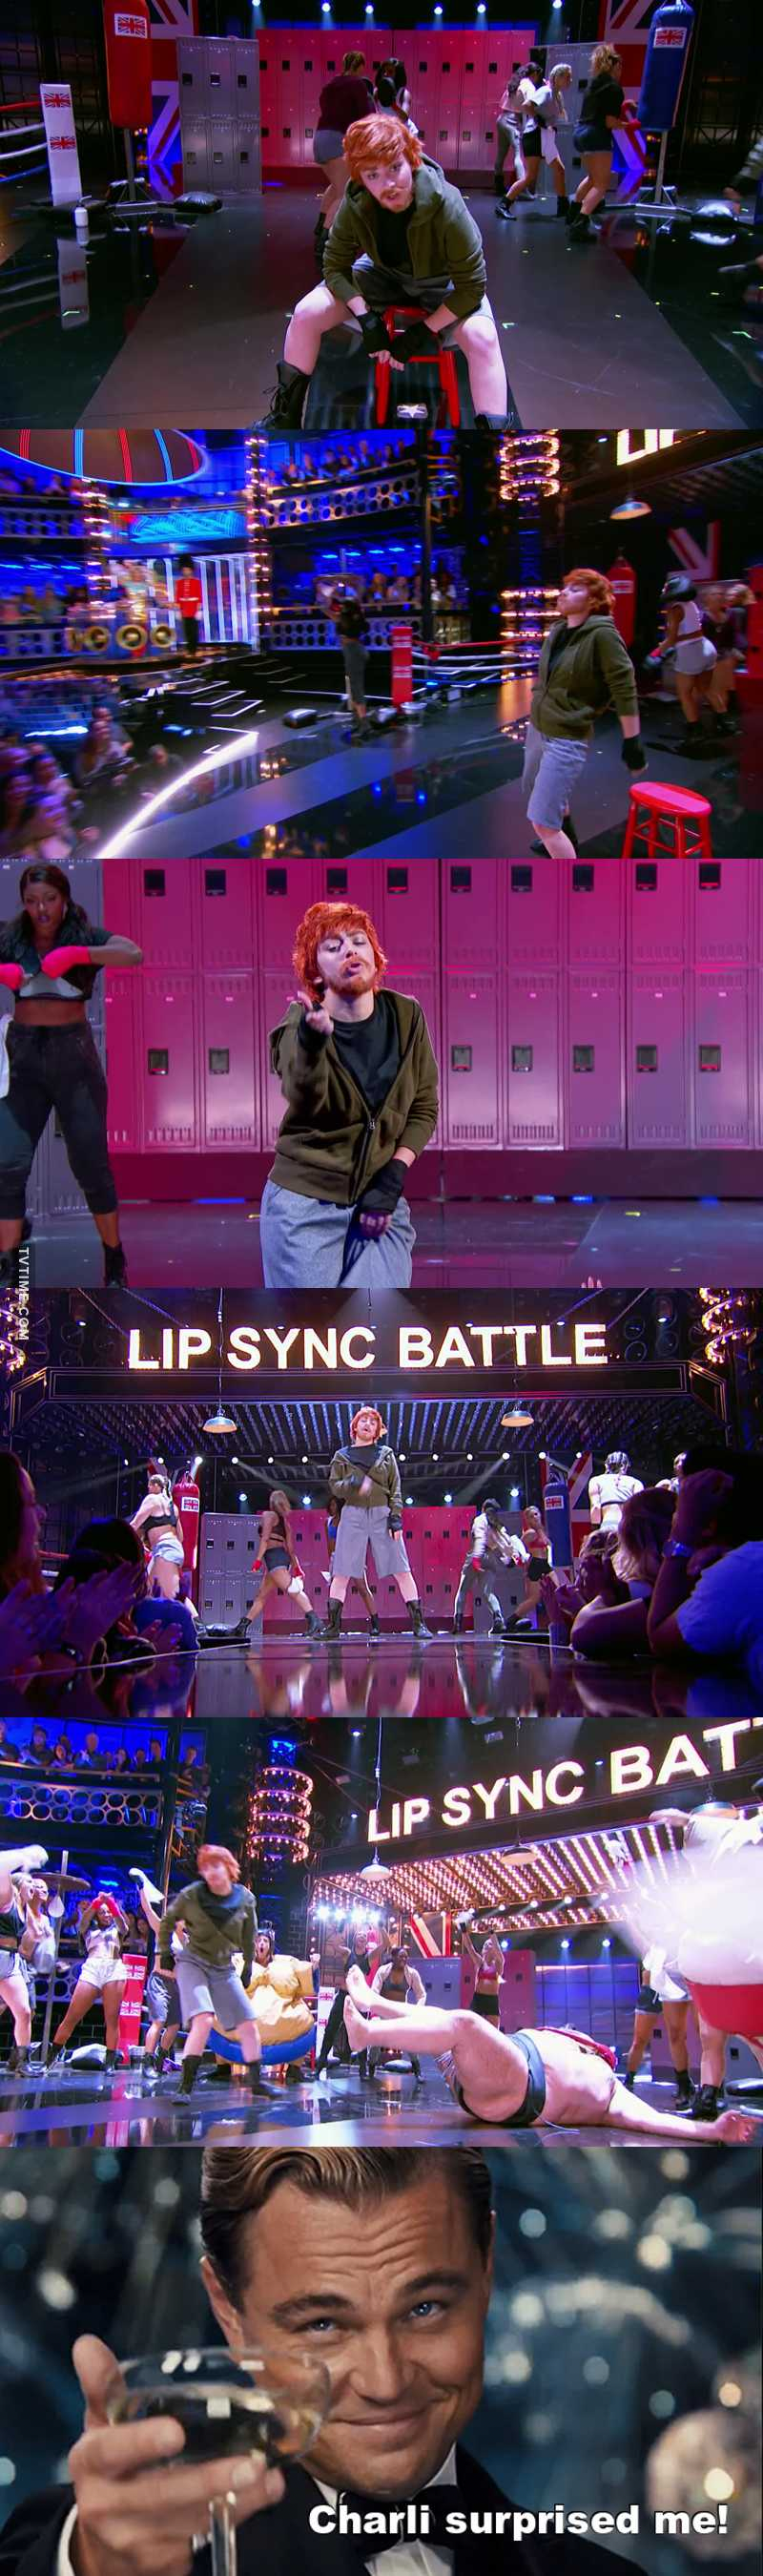 lip sync battle torrent